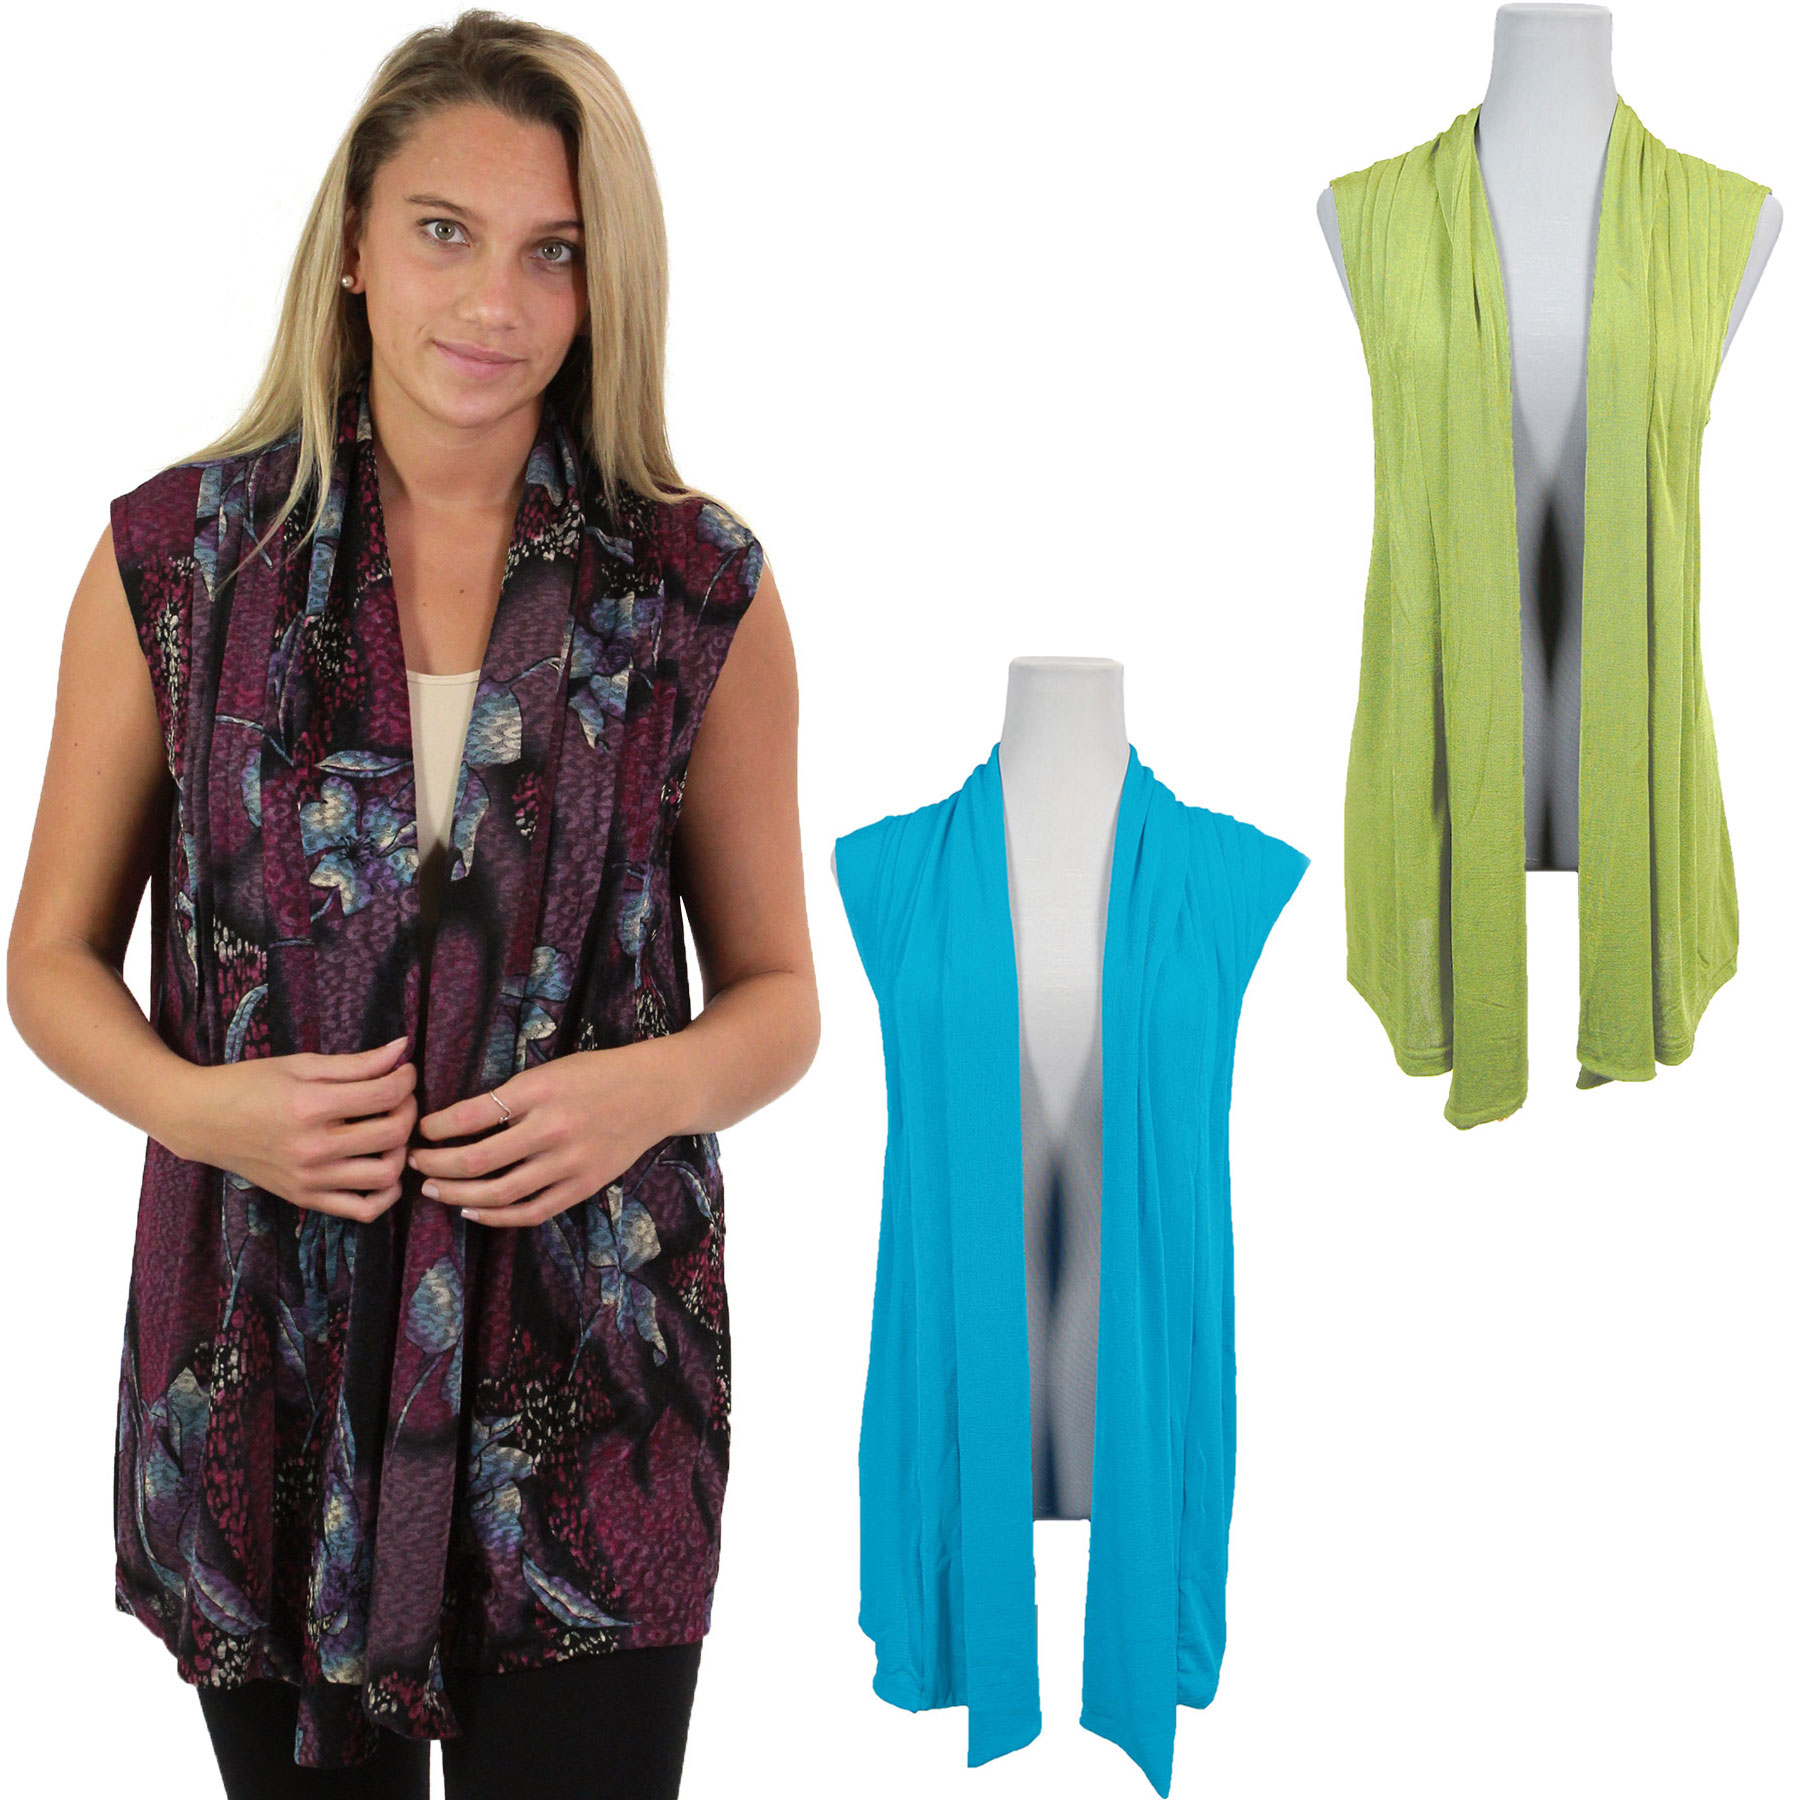 Slinky TravelWear Vest*